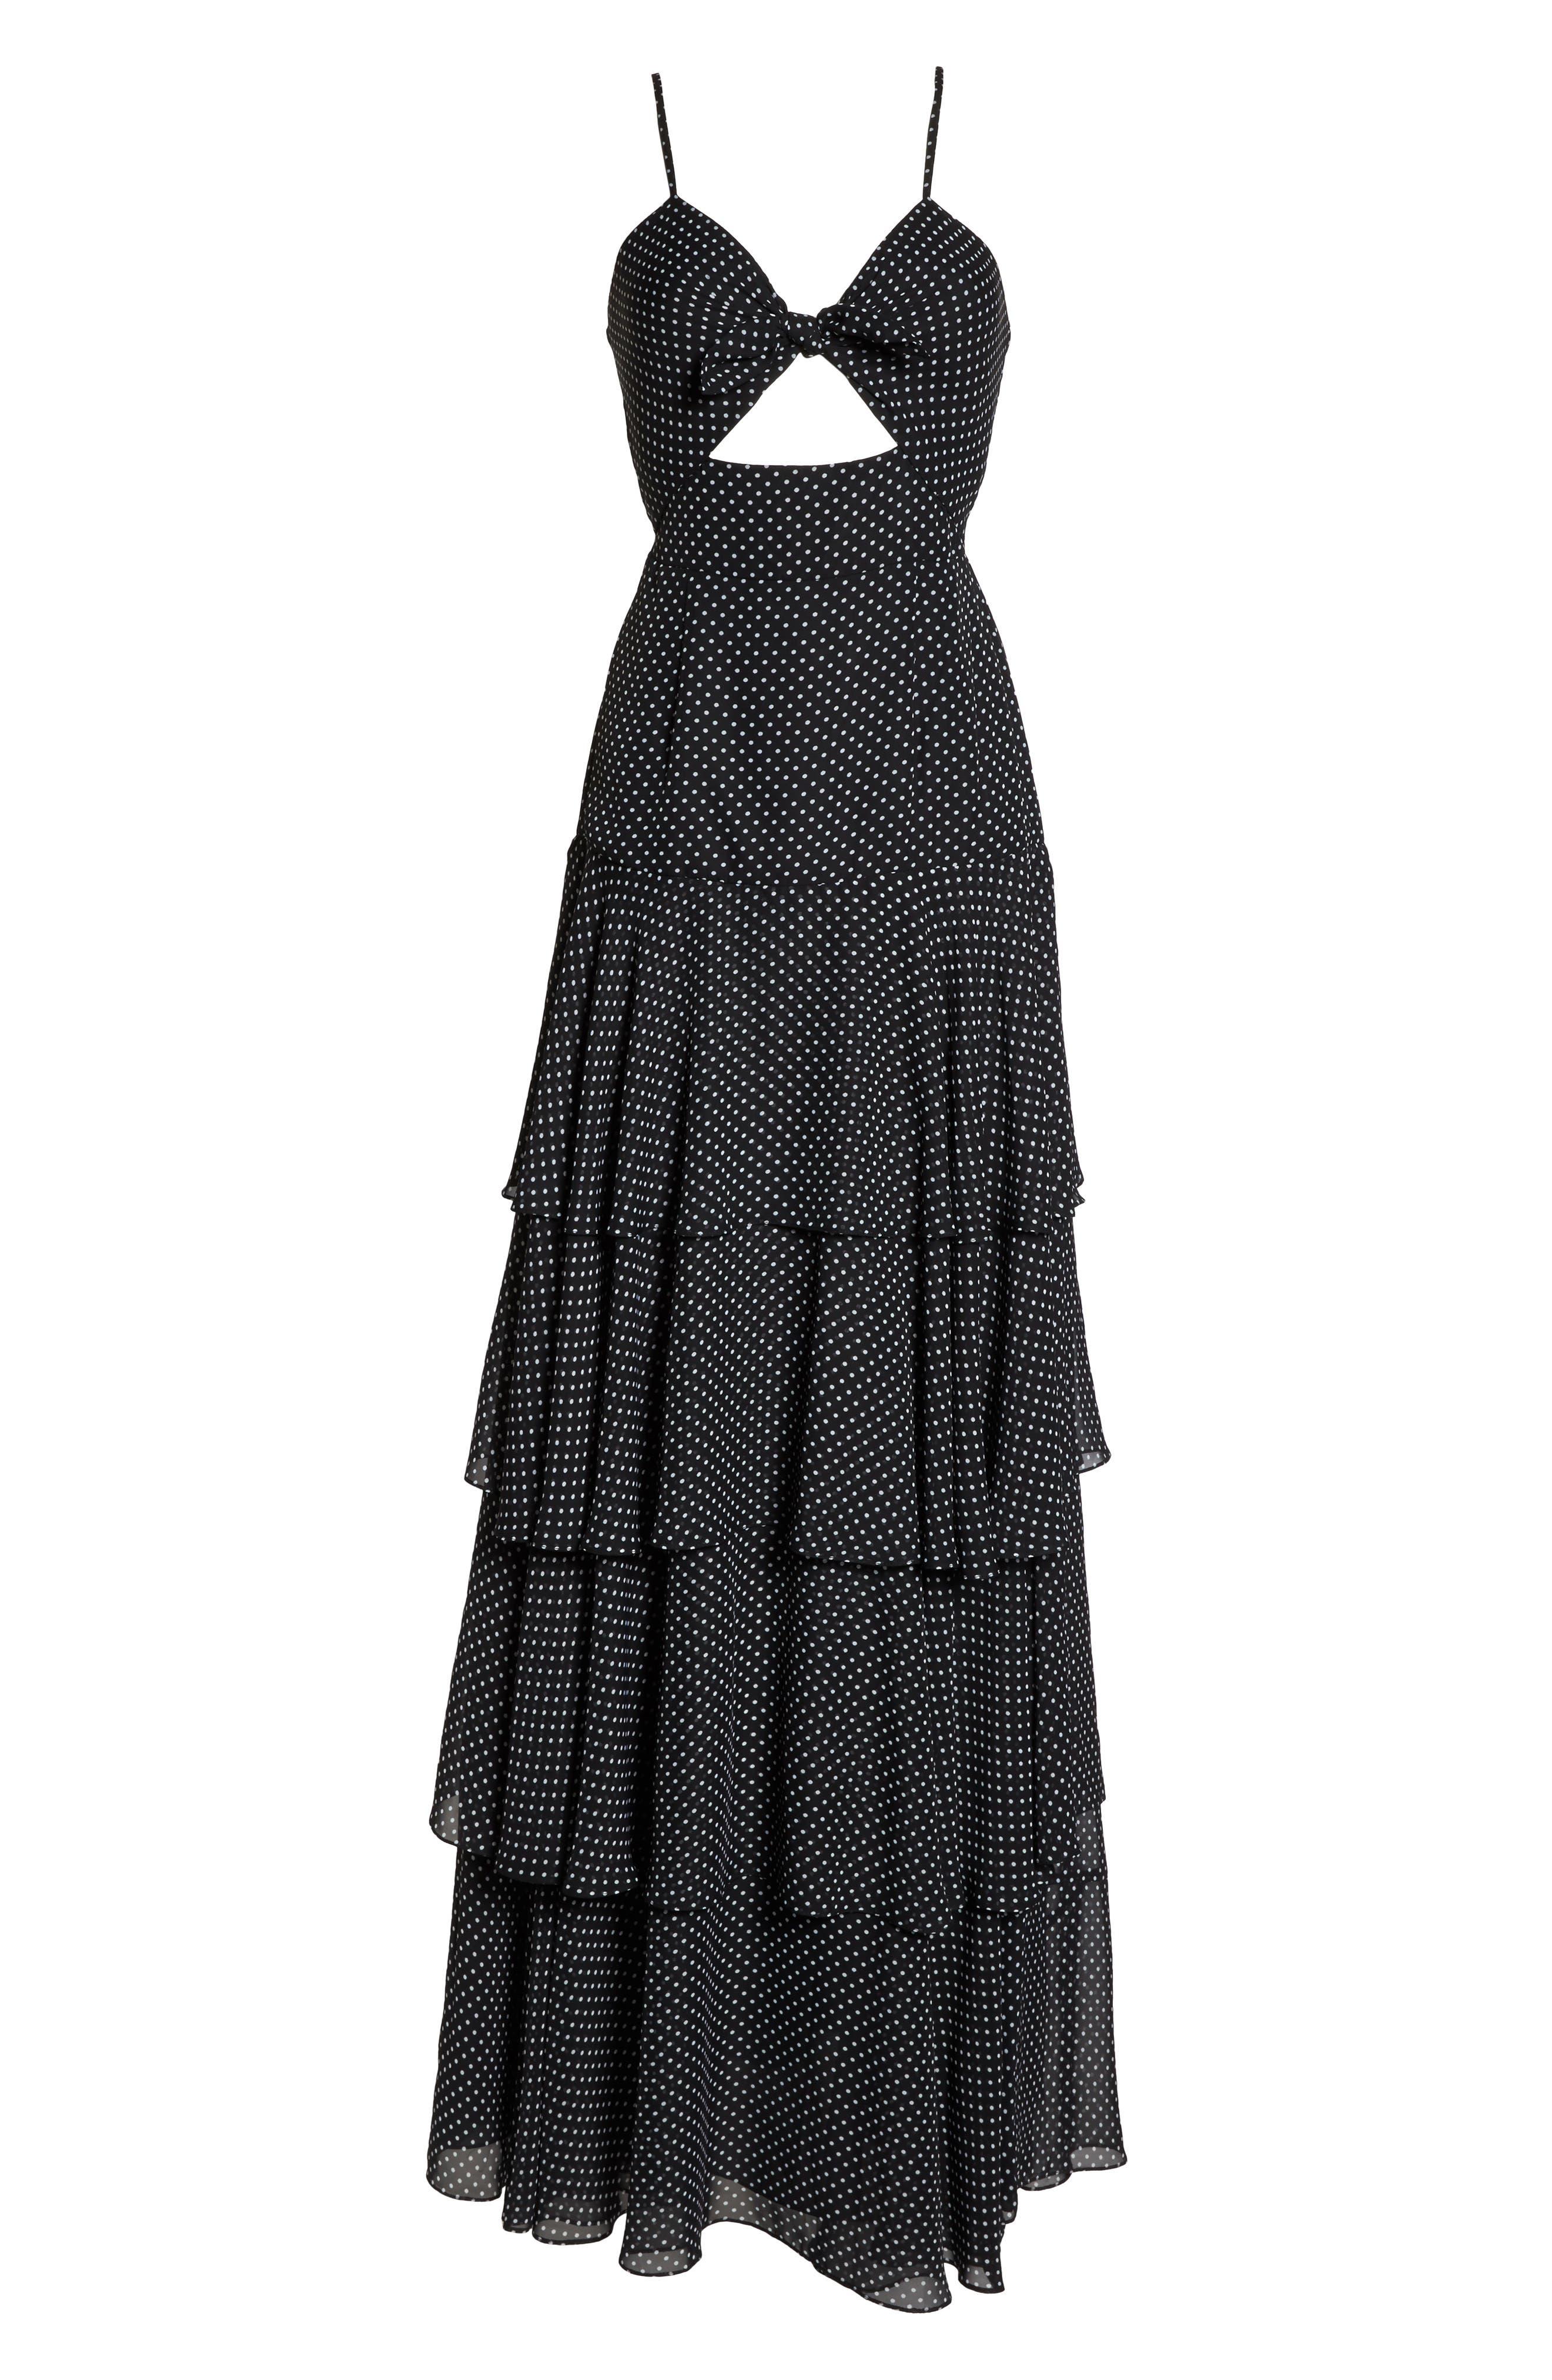 Polka Dot Tiered Gown,                             Alternate thumbnail 6, color,                             Black/ White